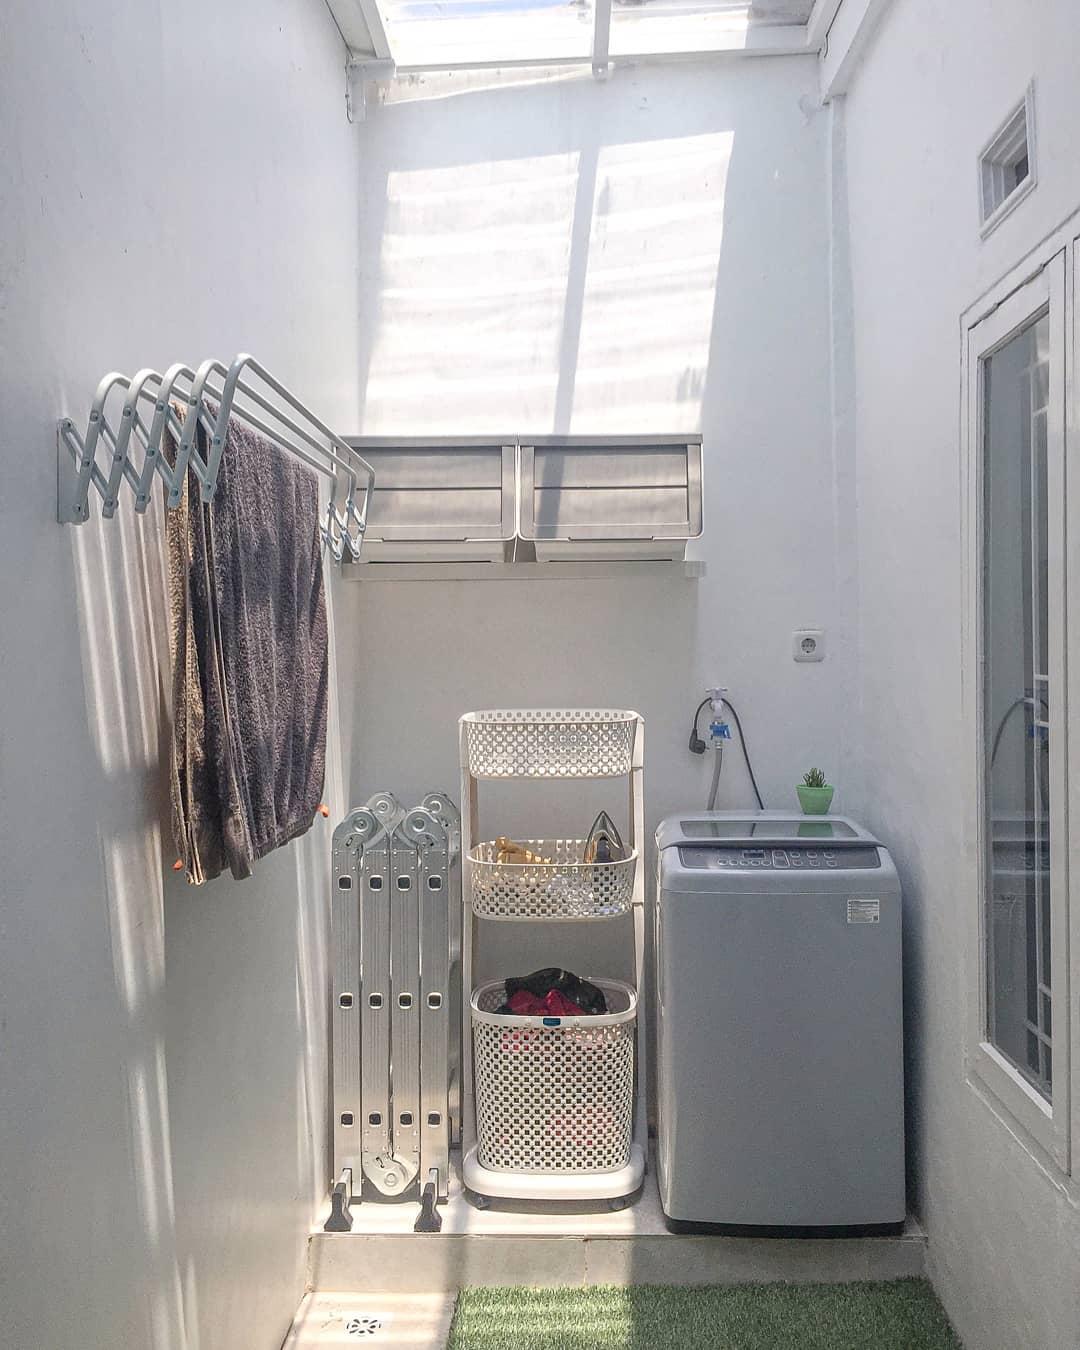 Laundry Room_2